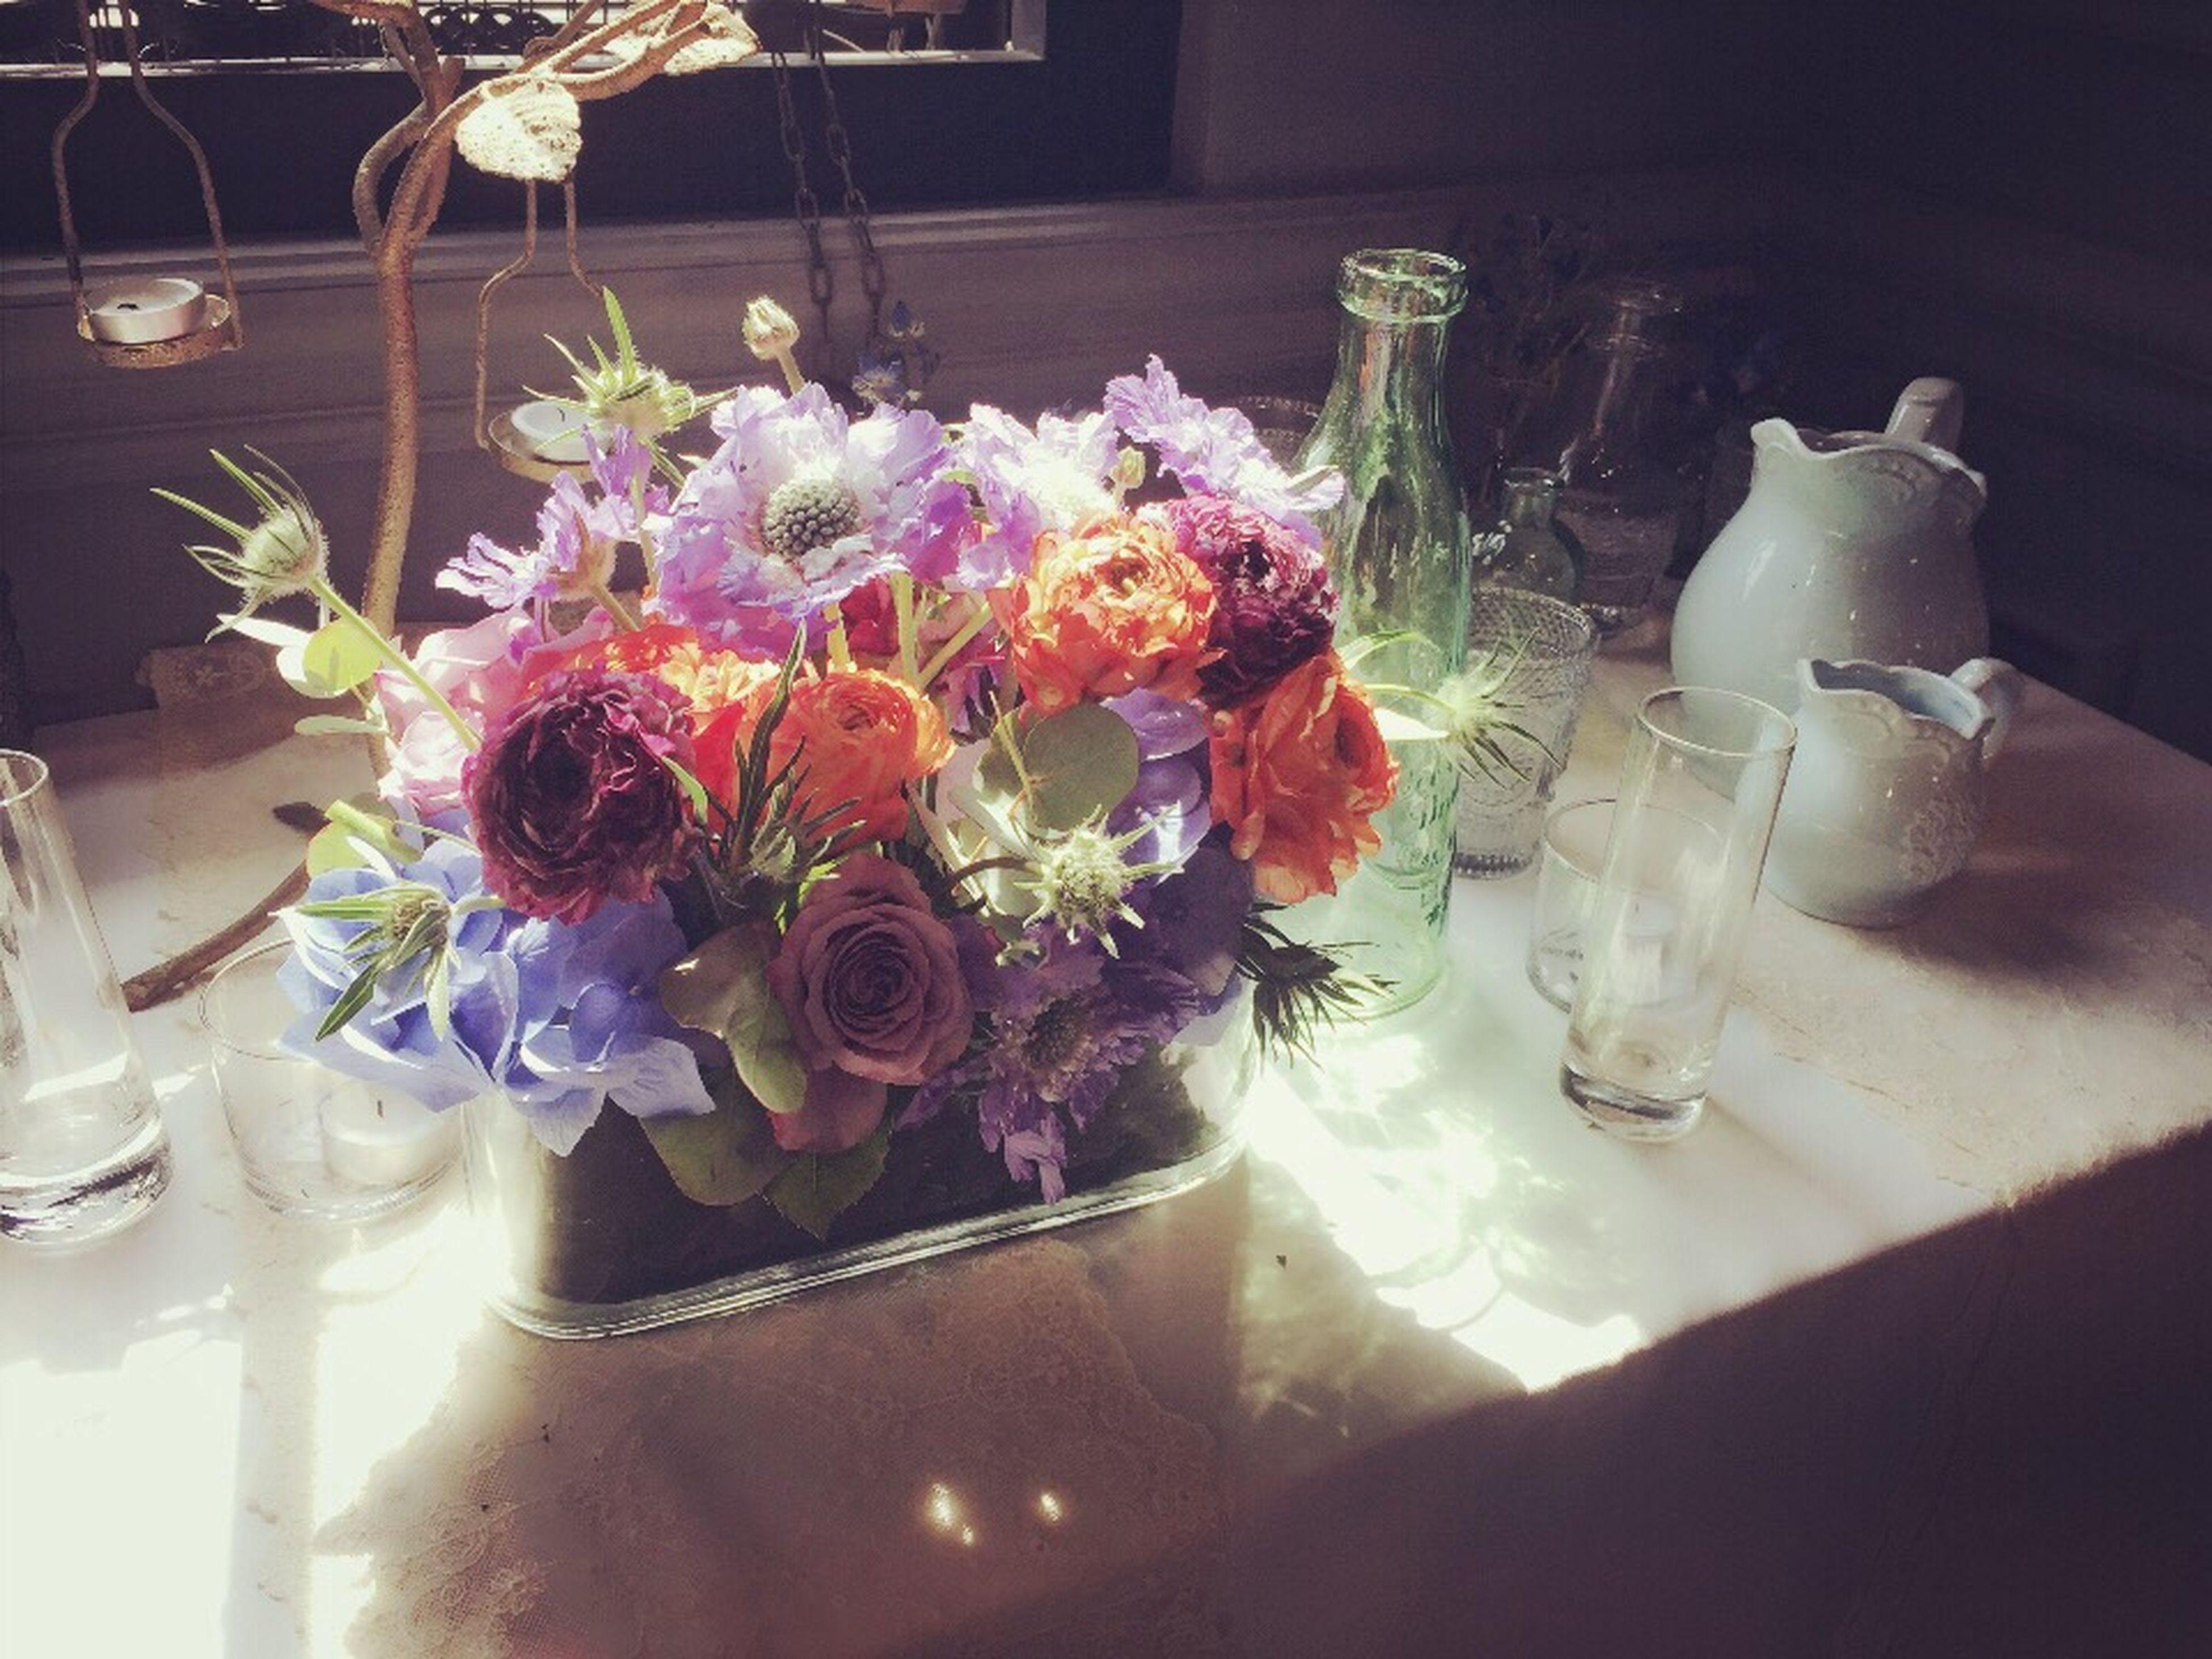 flower, indoors, vase, table, decoration, still life, freshness, variation, petal, home interior, fragility, flower arrangement, glass - material, no people, reflection, arrangement, high angle view, potted plant, flower pot, bouquet